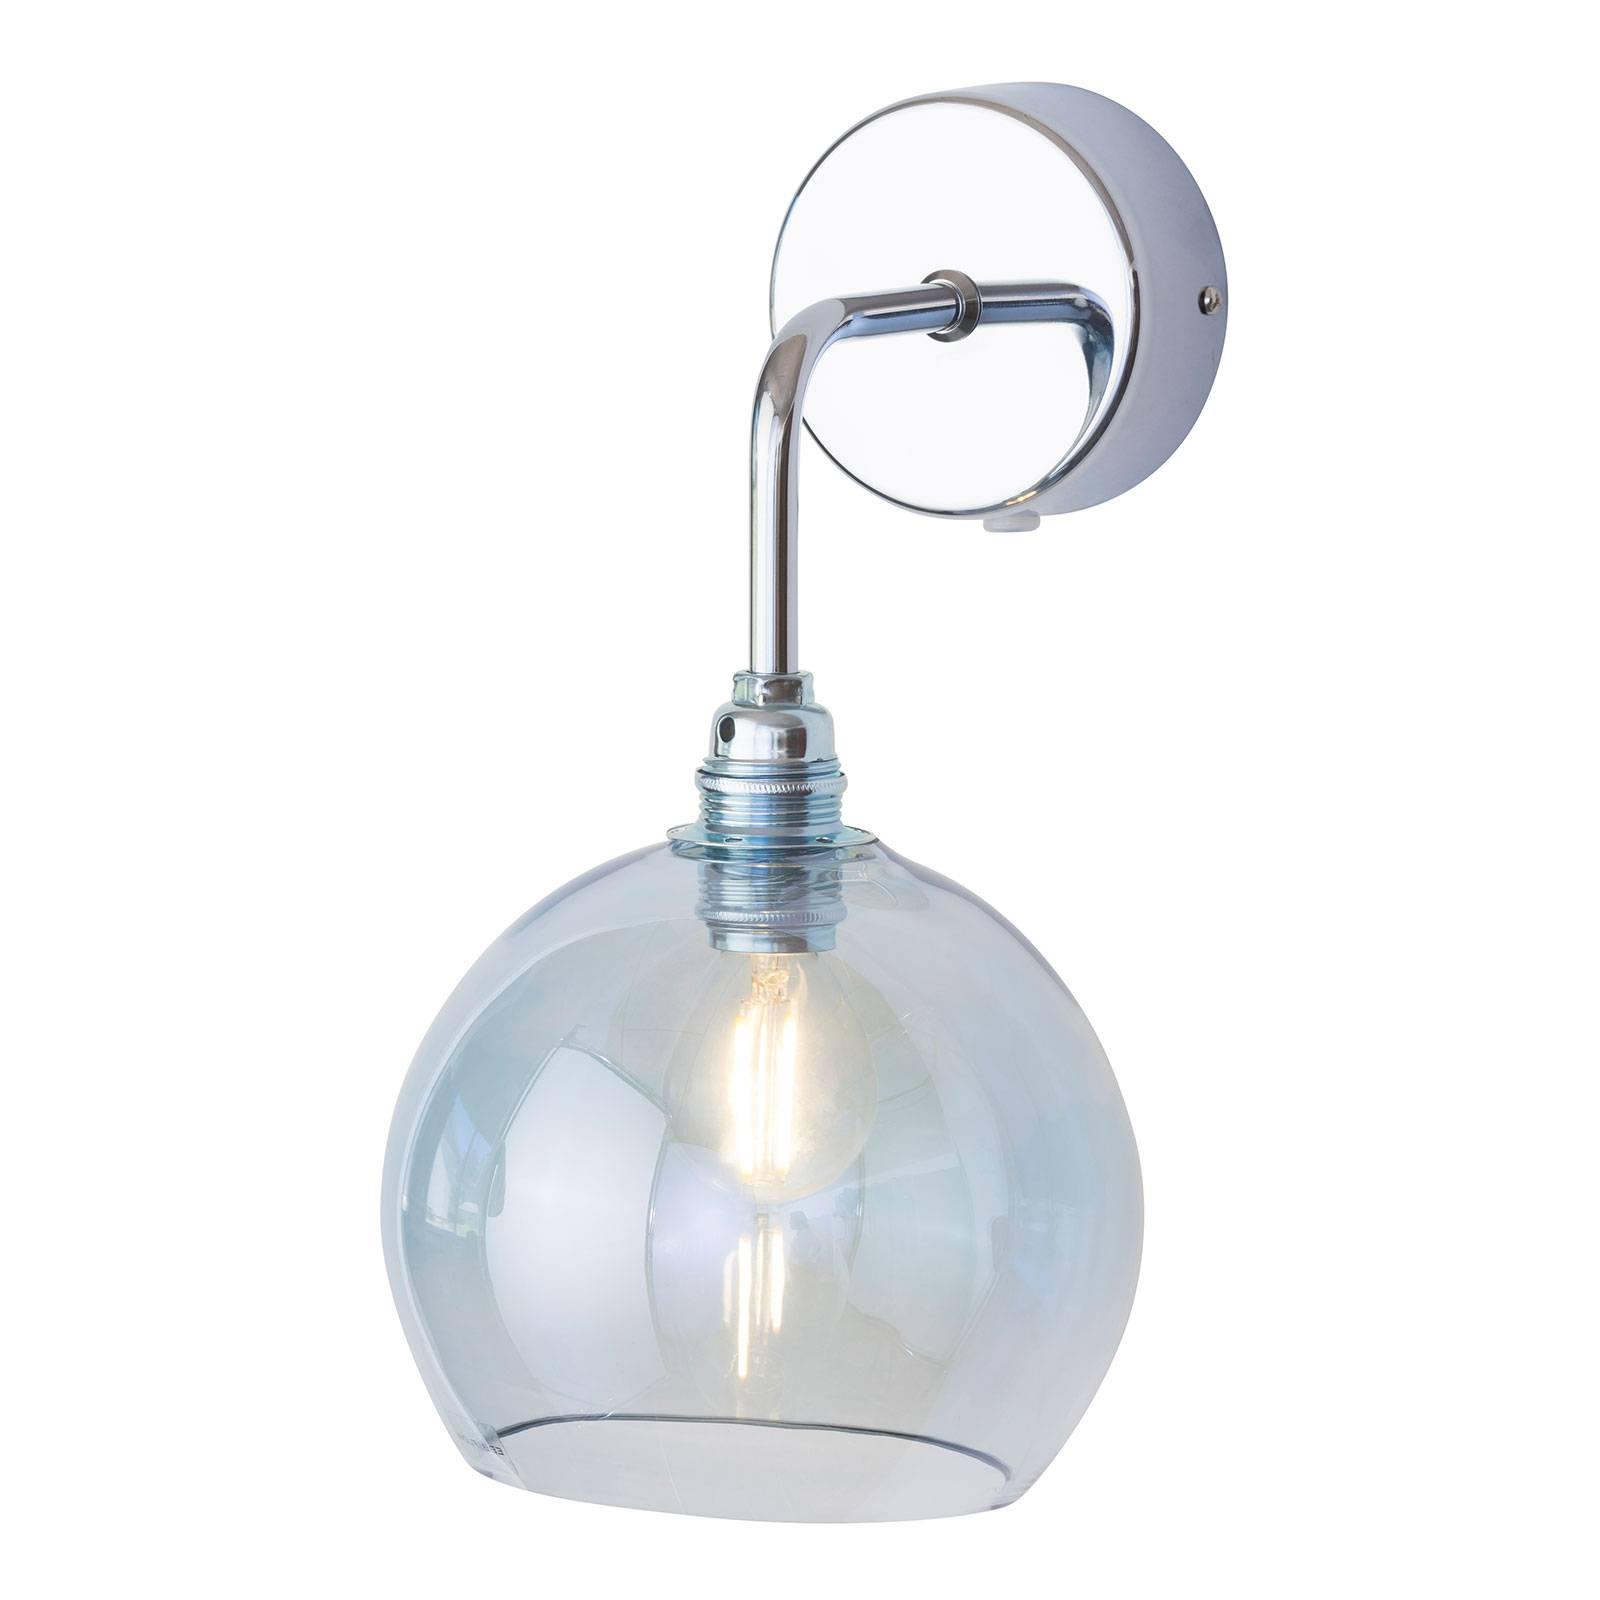 EBB & FLOW Rowan wandlamp zilver kap topaasblauw